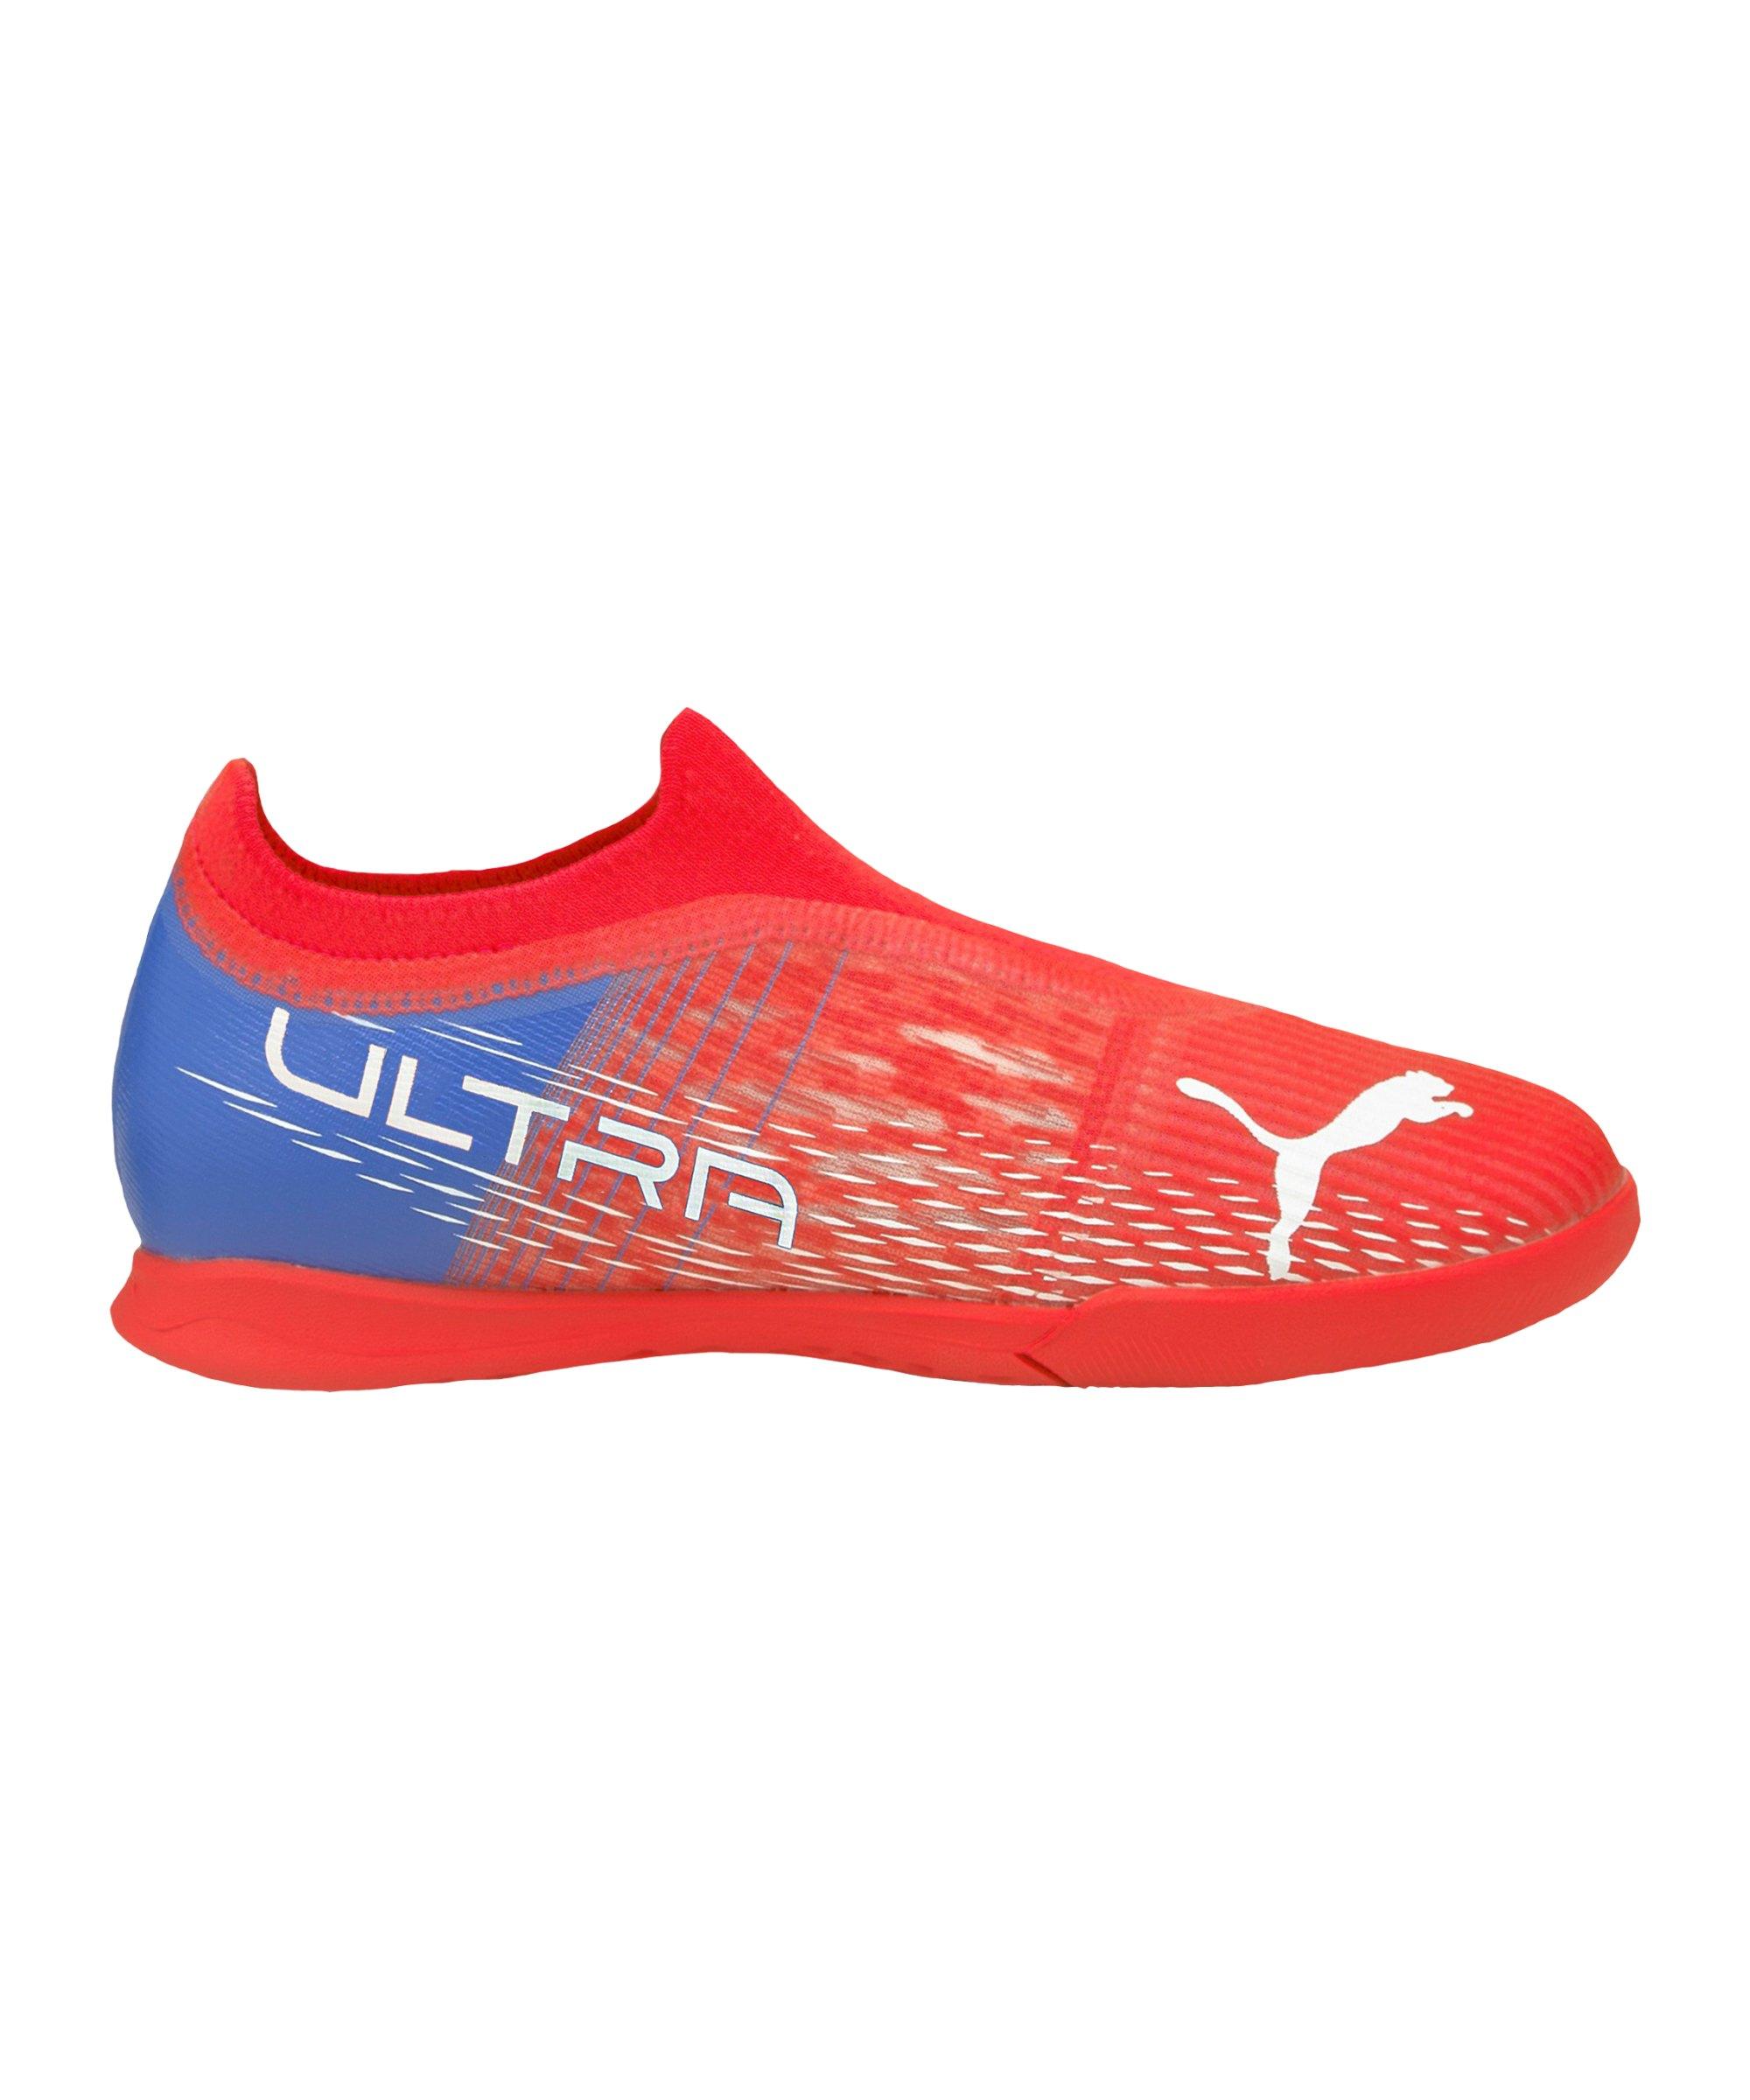 PUMA ULTRA 3.3 Faster Football IT Halle Kids Rot Weiss F01 - rot